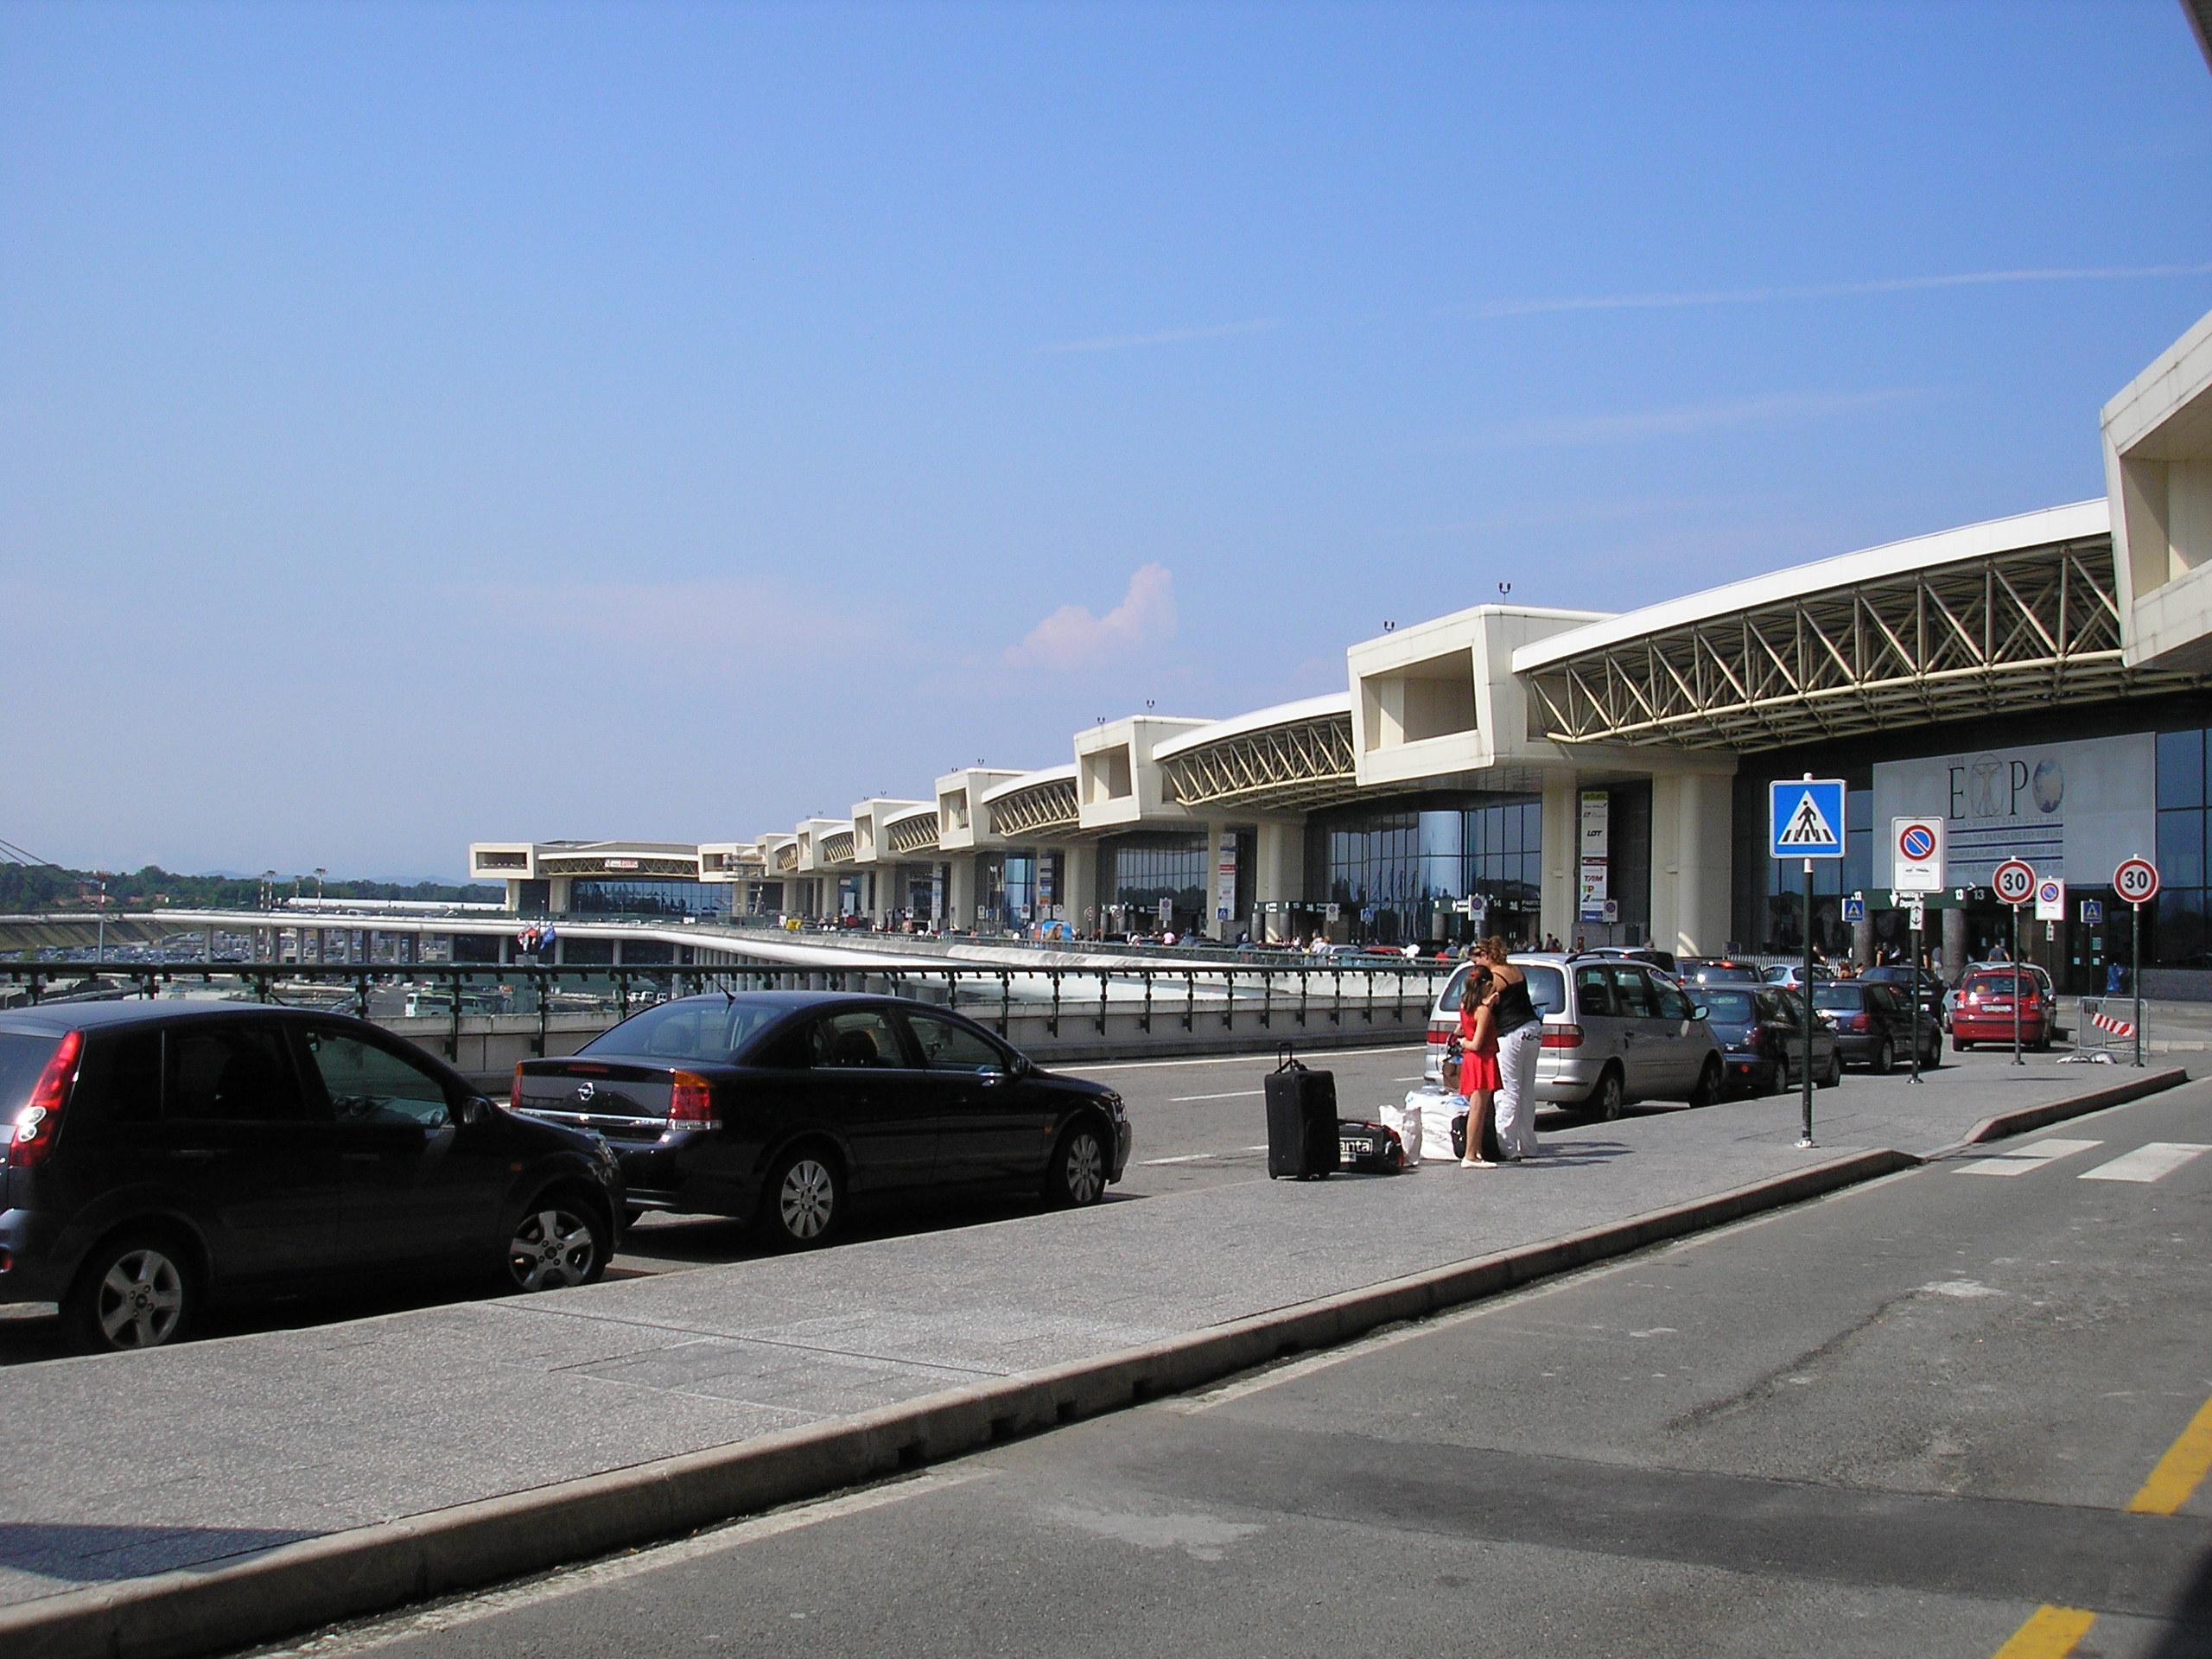 Aeroporto Italia : File milano malpensa terminal g